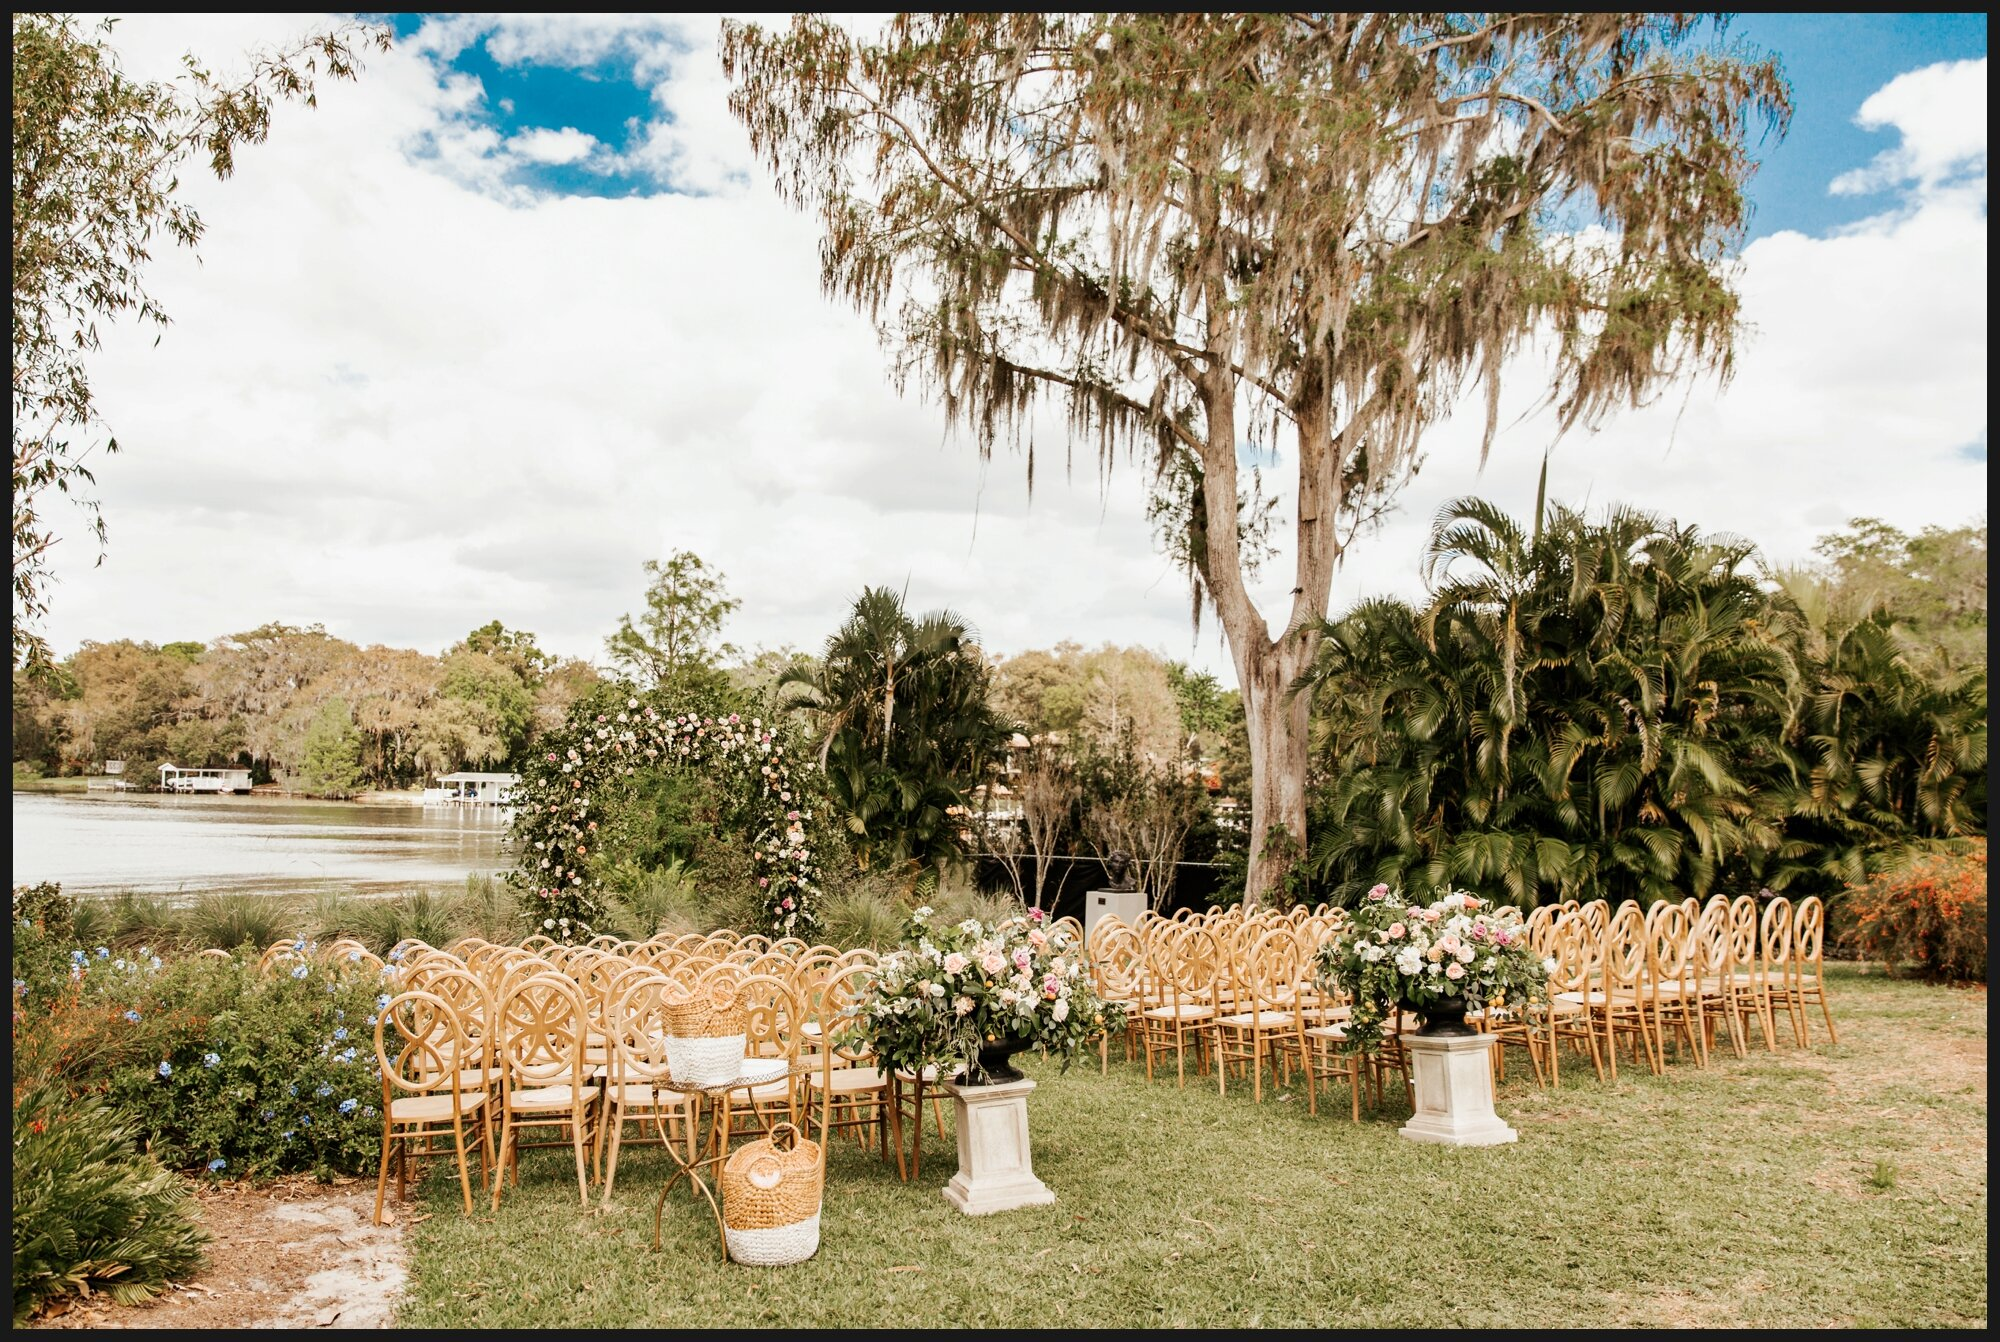 Orlando-Wedding-Photographer-destination-wedding-photographer-florida-wedding-photographer-hawaii-wedding-photographer_0750.jpg